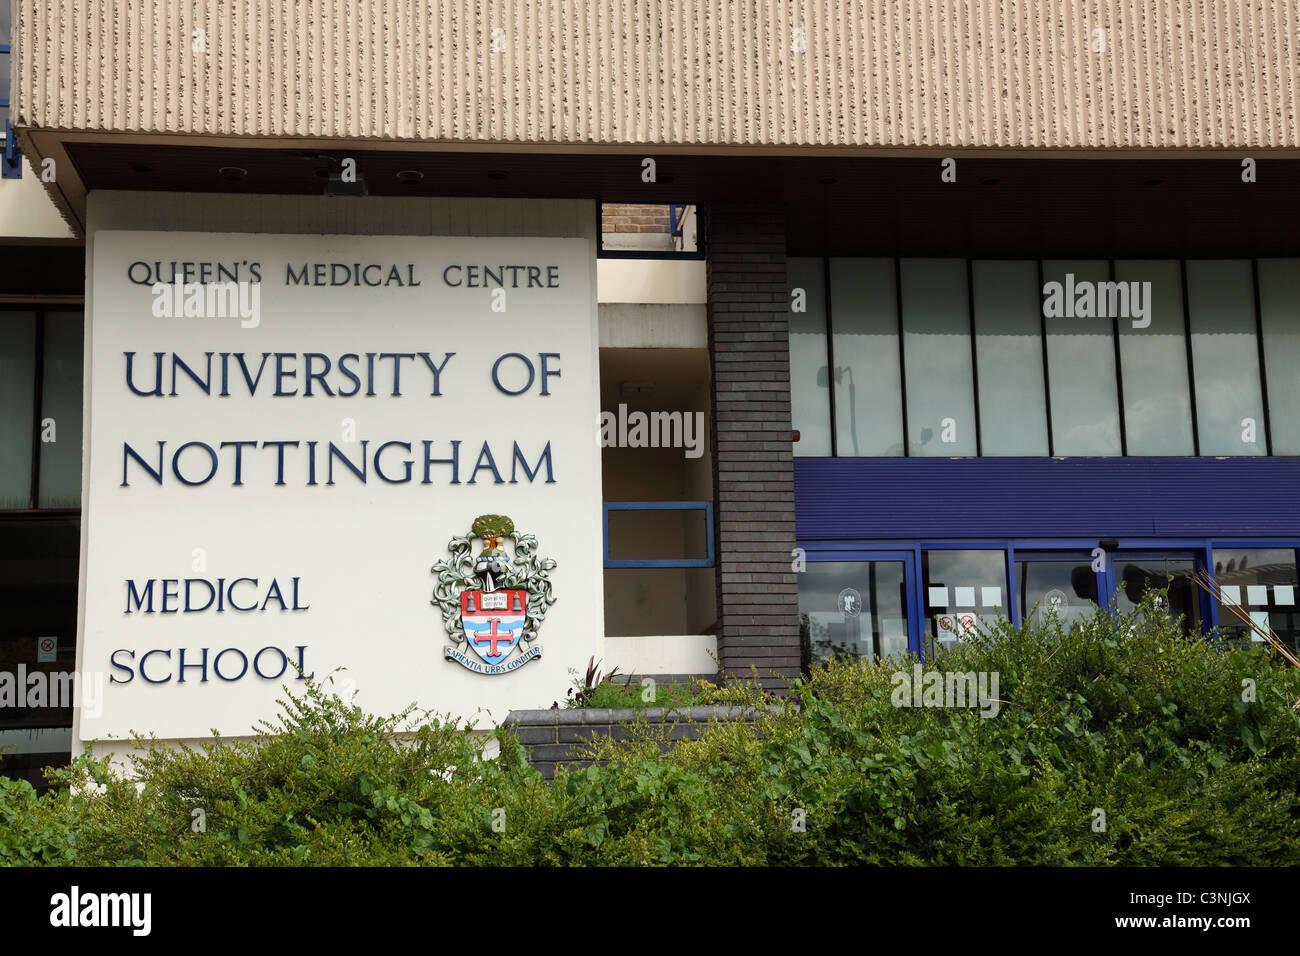 The Queen's Medical Centre (QMC), Medical School, University Hospital, Nottingham, England, U.K. - Stock Image